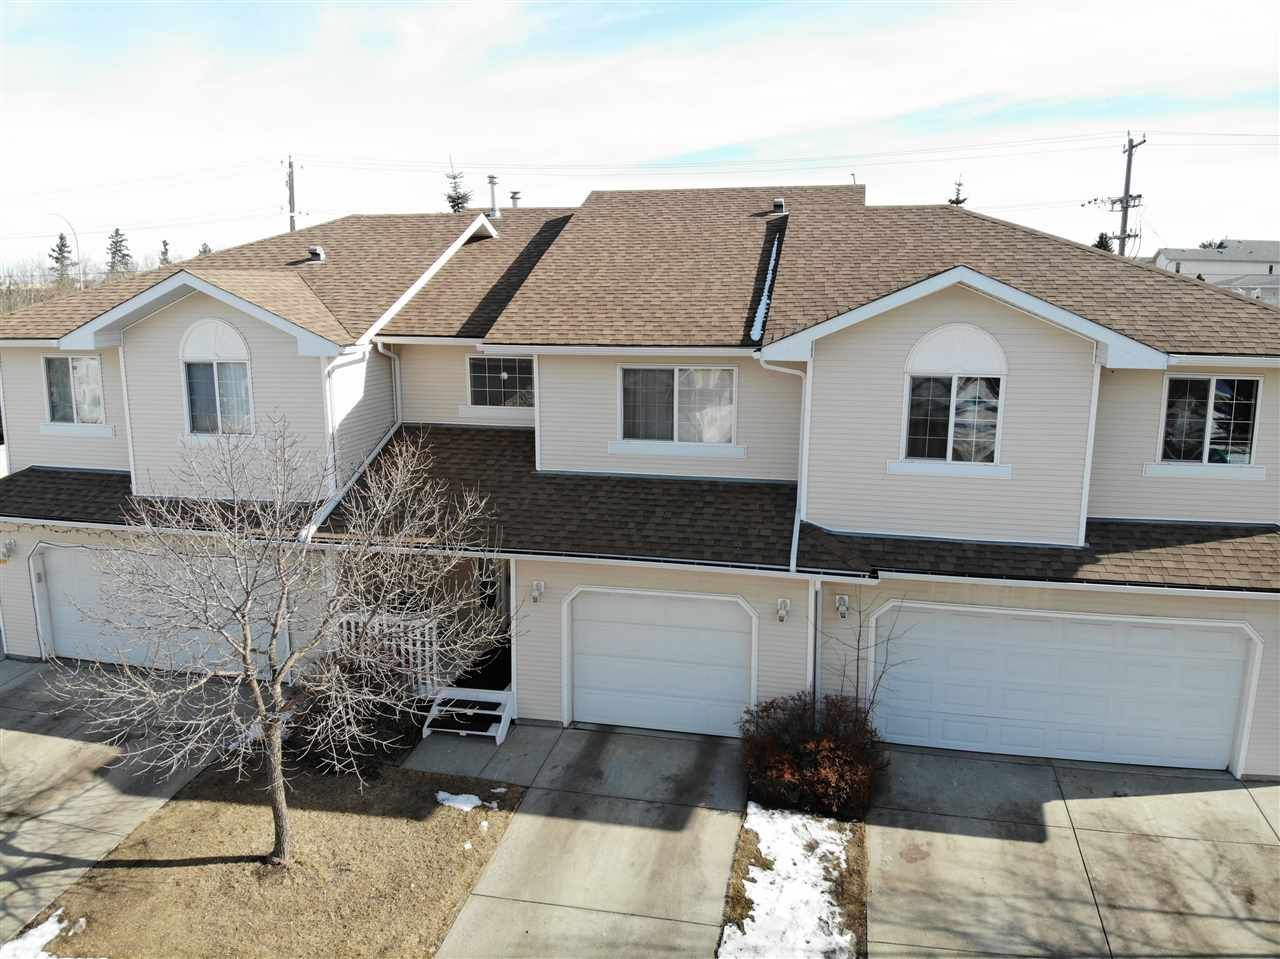 Main Photo: 16 6608 158 Avenue in Edmonton: Zone 28 Townhouse for sale : MLS®# E4232786